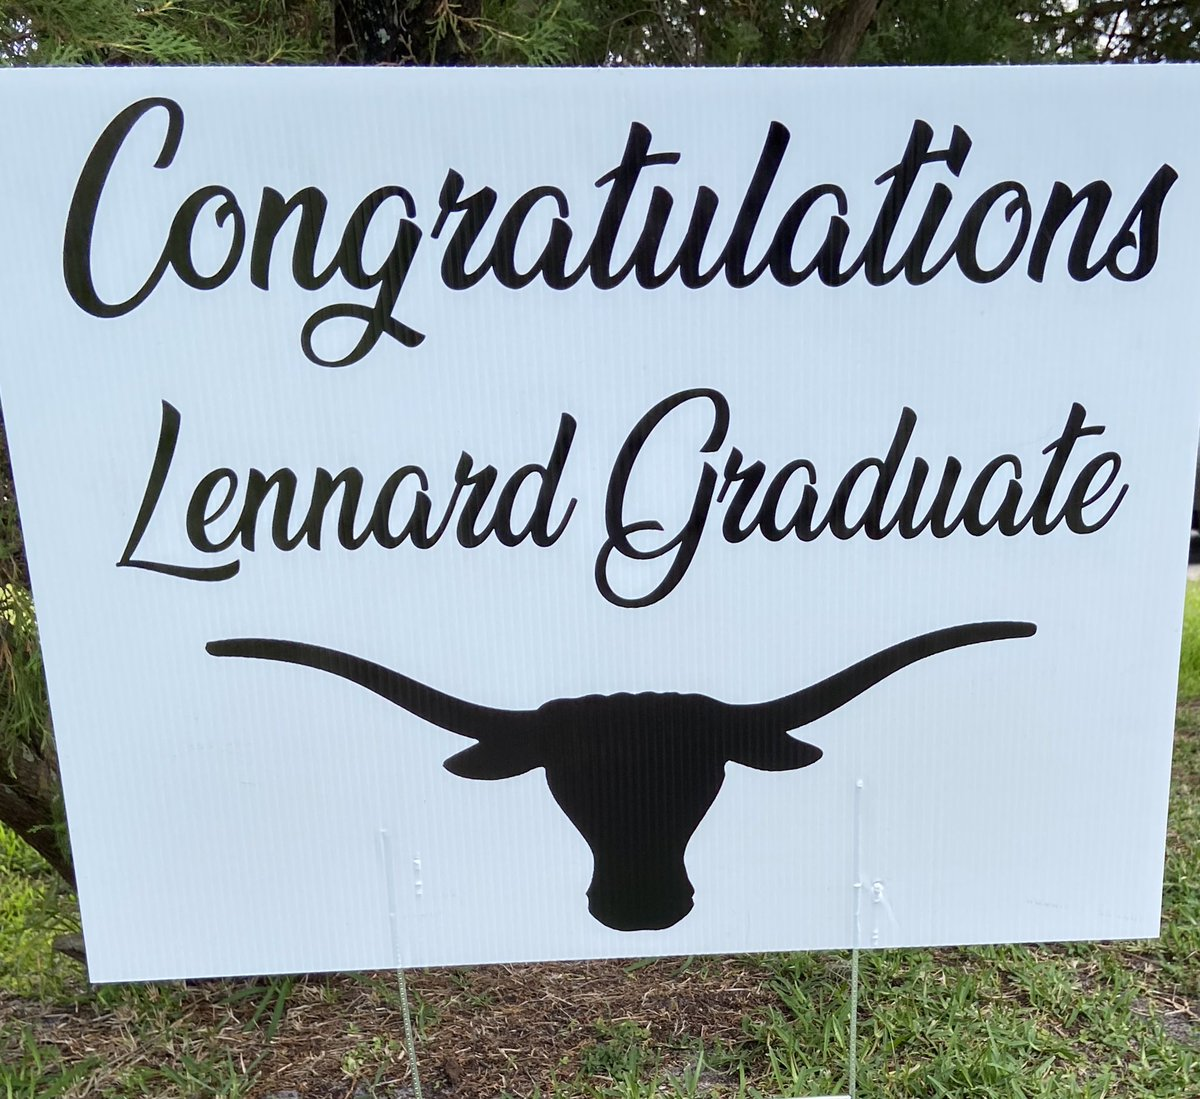 Congratulations 2020!! ❤️ you all!! 🎊🎉🧡🧡🧡🤟🤘🏻🤘🏻👊🏼👊🏼🙌🙌 Lennard High School @LennardHigh